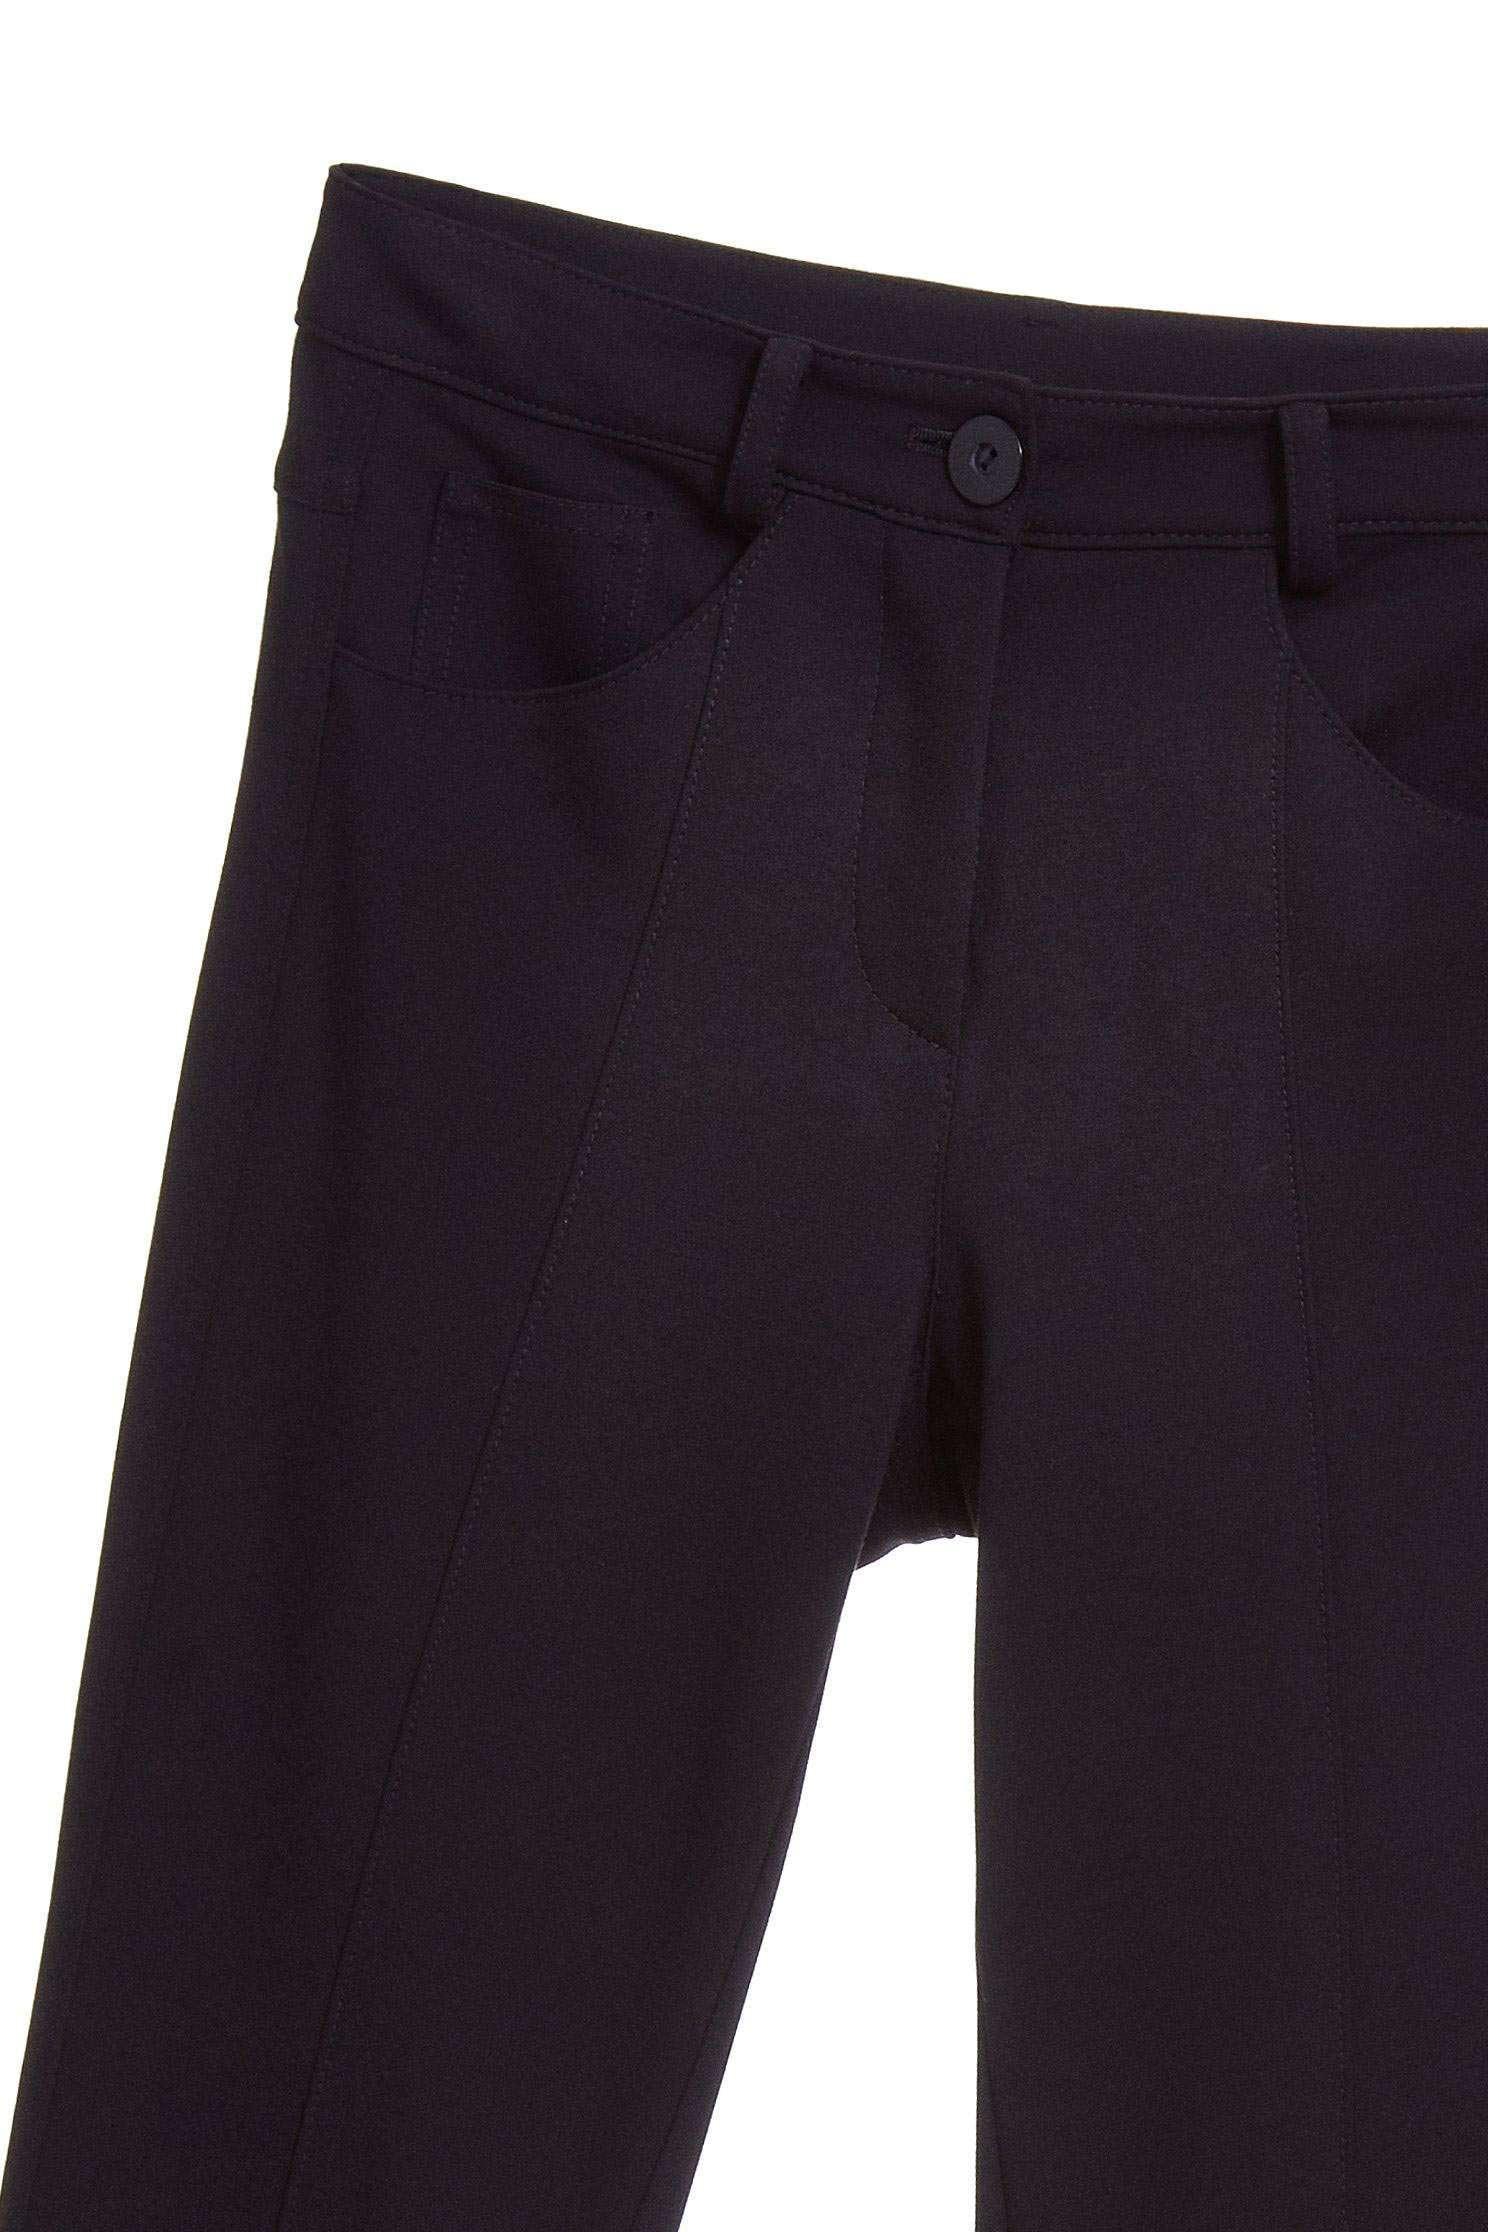 Basic slim classic trousers,Skinny pants,Pants,長褲,Thin pants,Black trousers